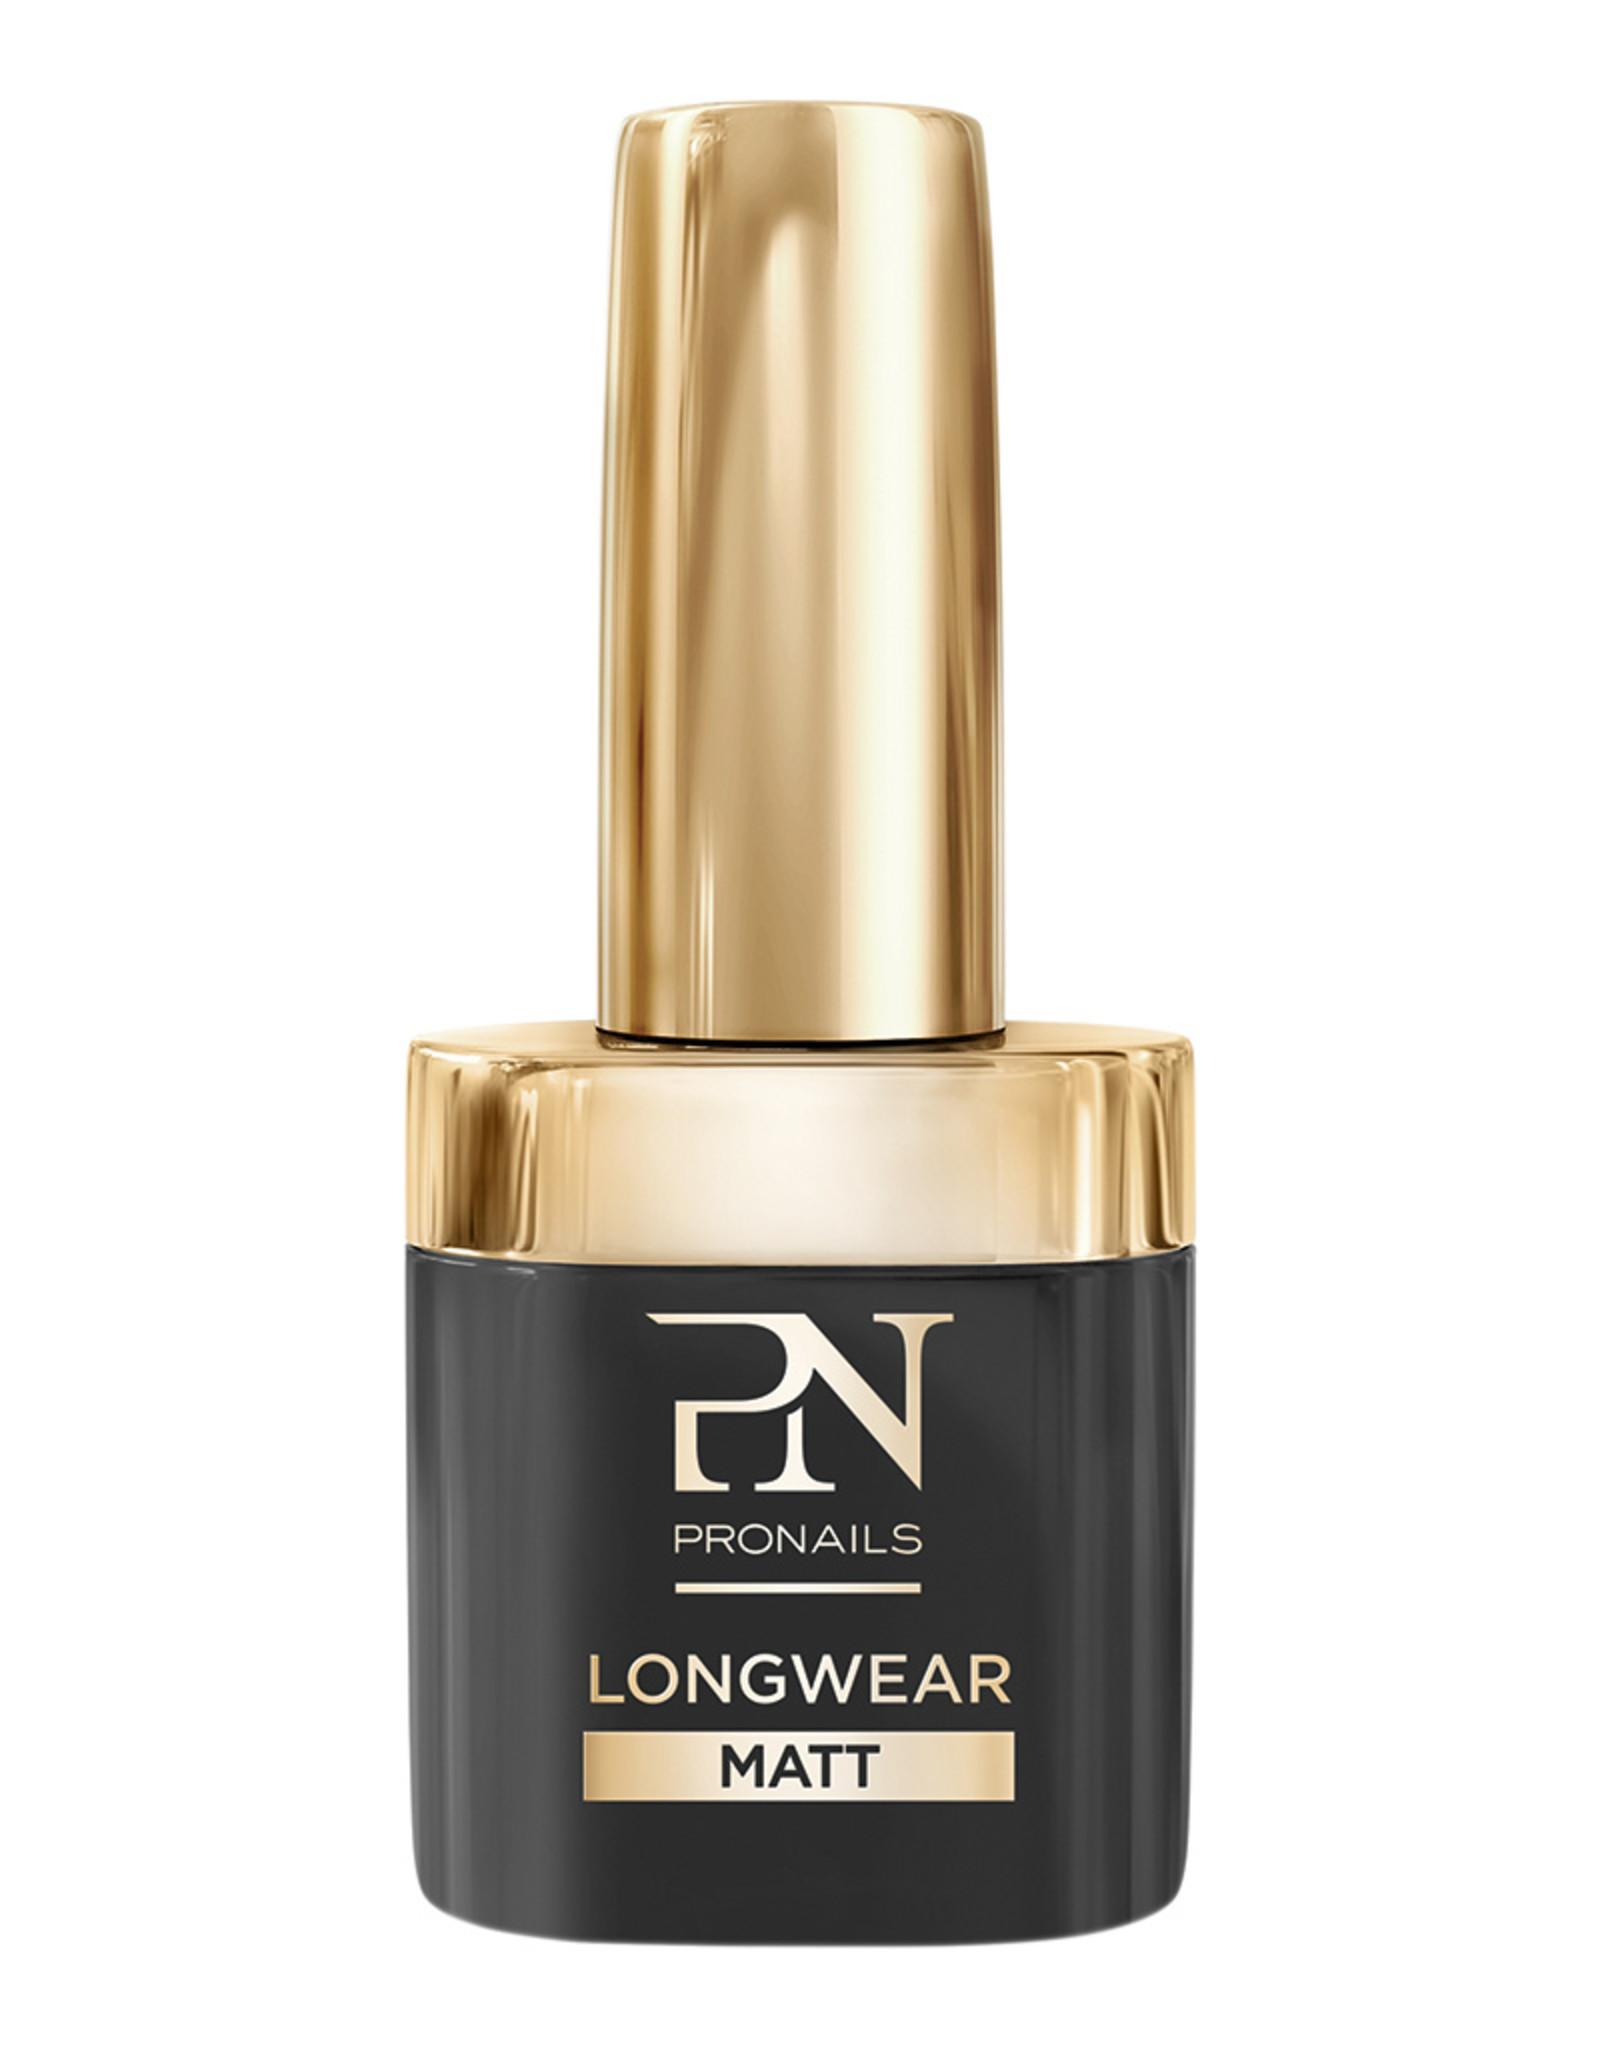 Pronails Longwear Finish Matt 10 ML